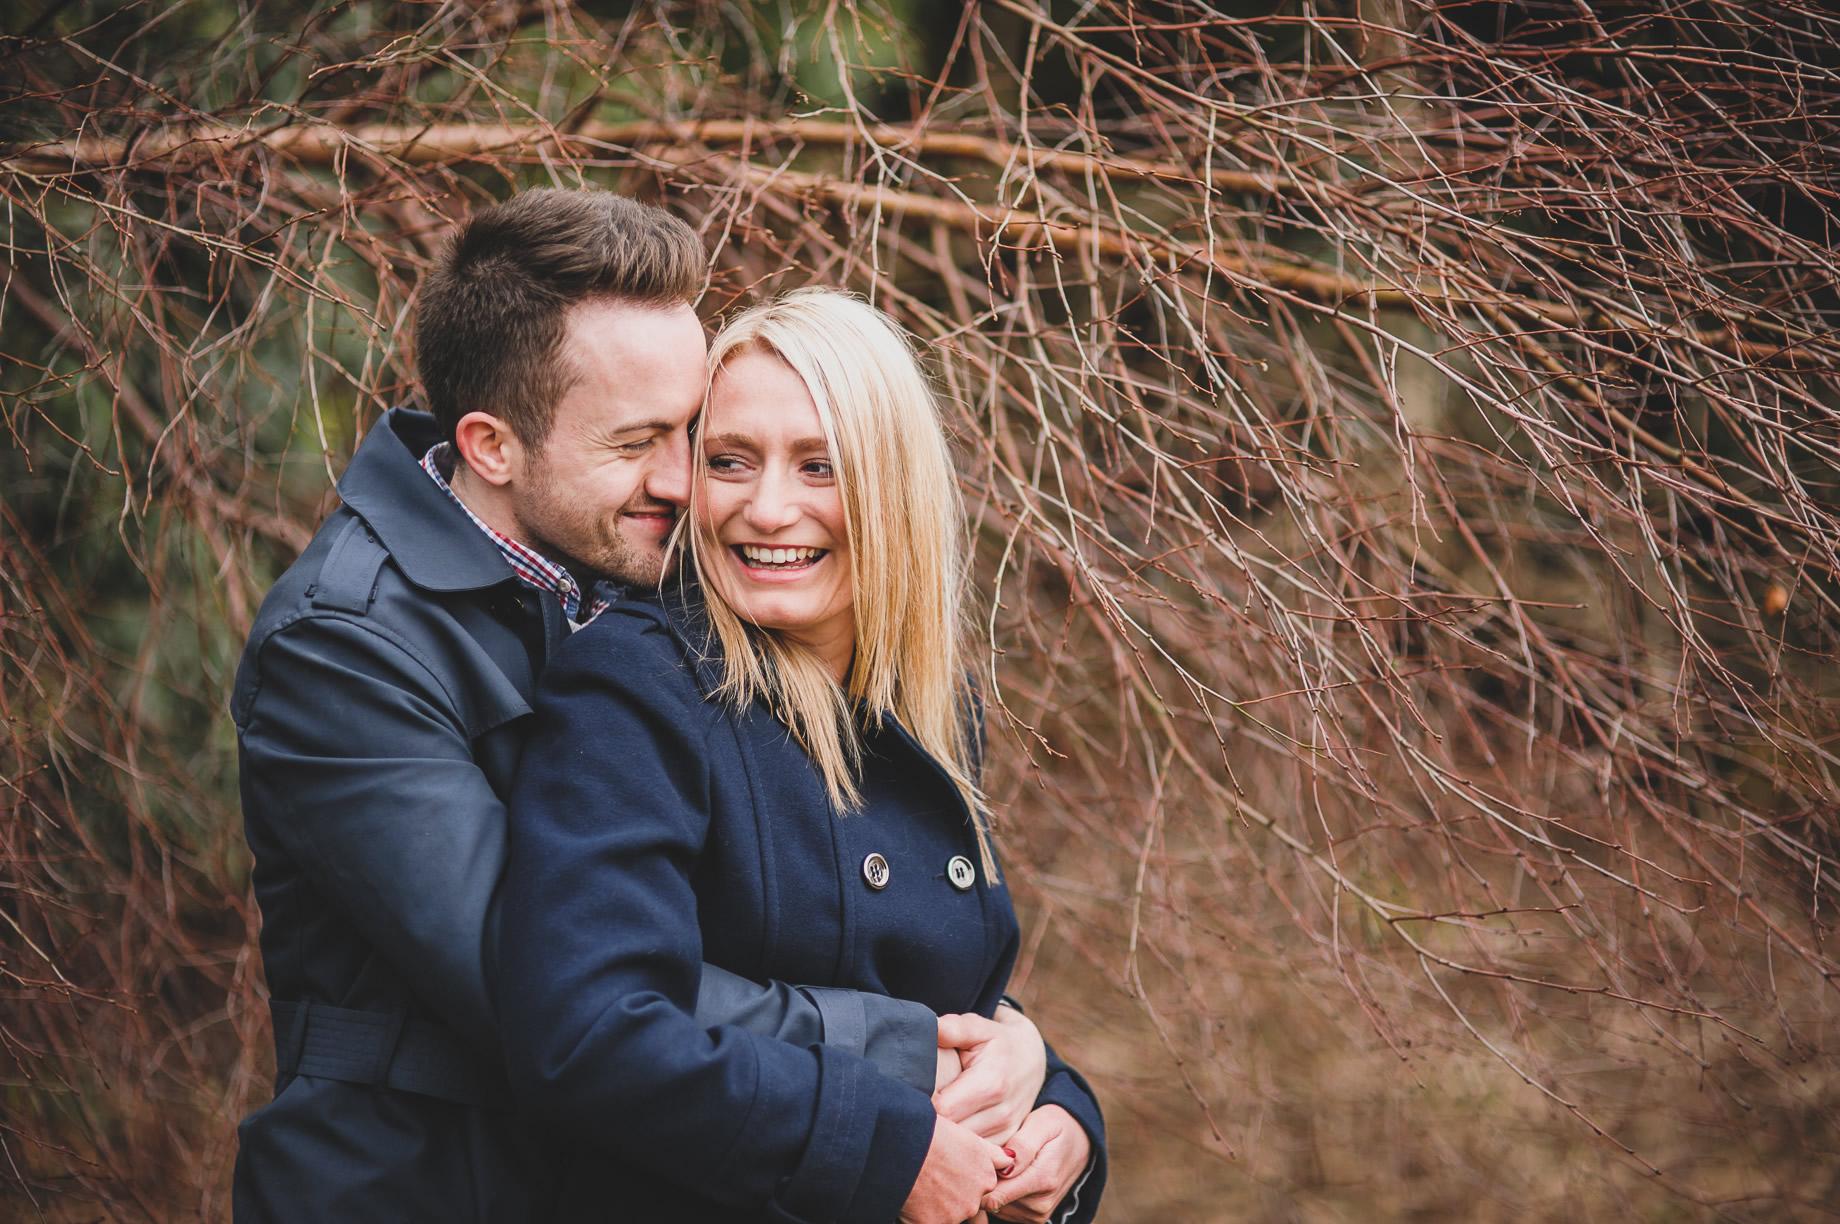 Rachel and Christian Pre-Wedding Shoot at Errwood Hall Ruins 028